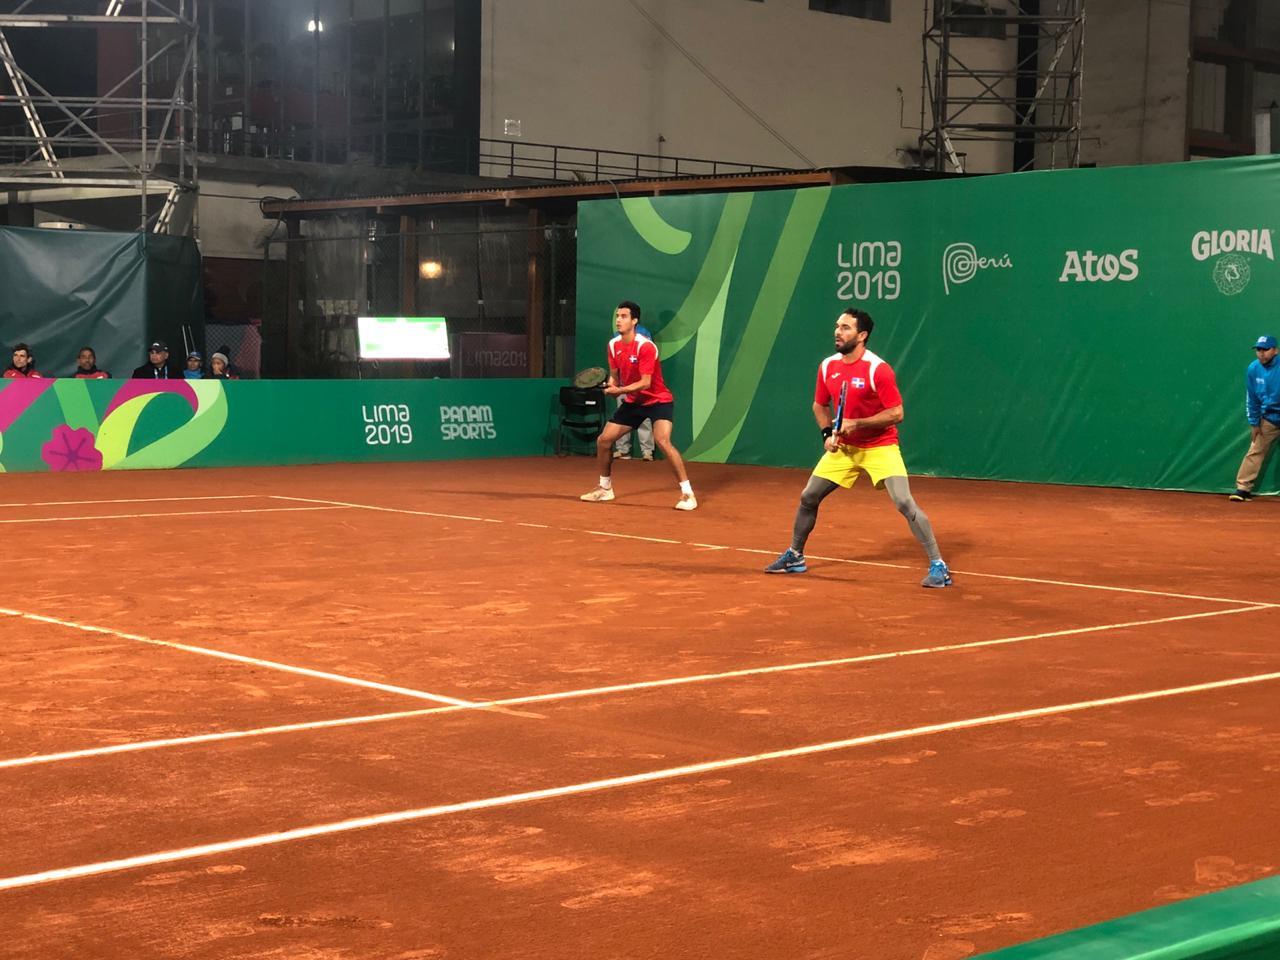 Víctor Estrella y Roberto Cid a tercera ronda dobles tenis Panam